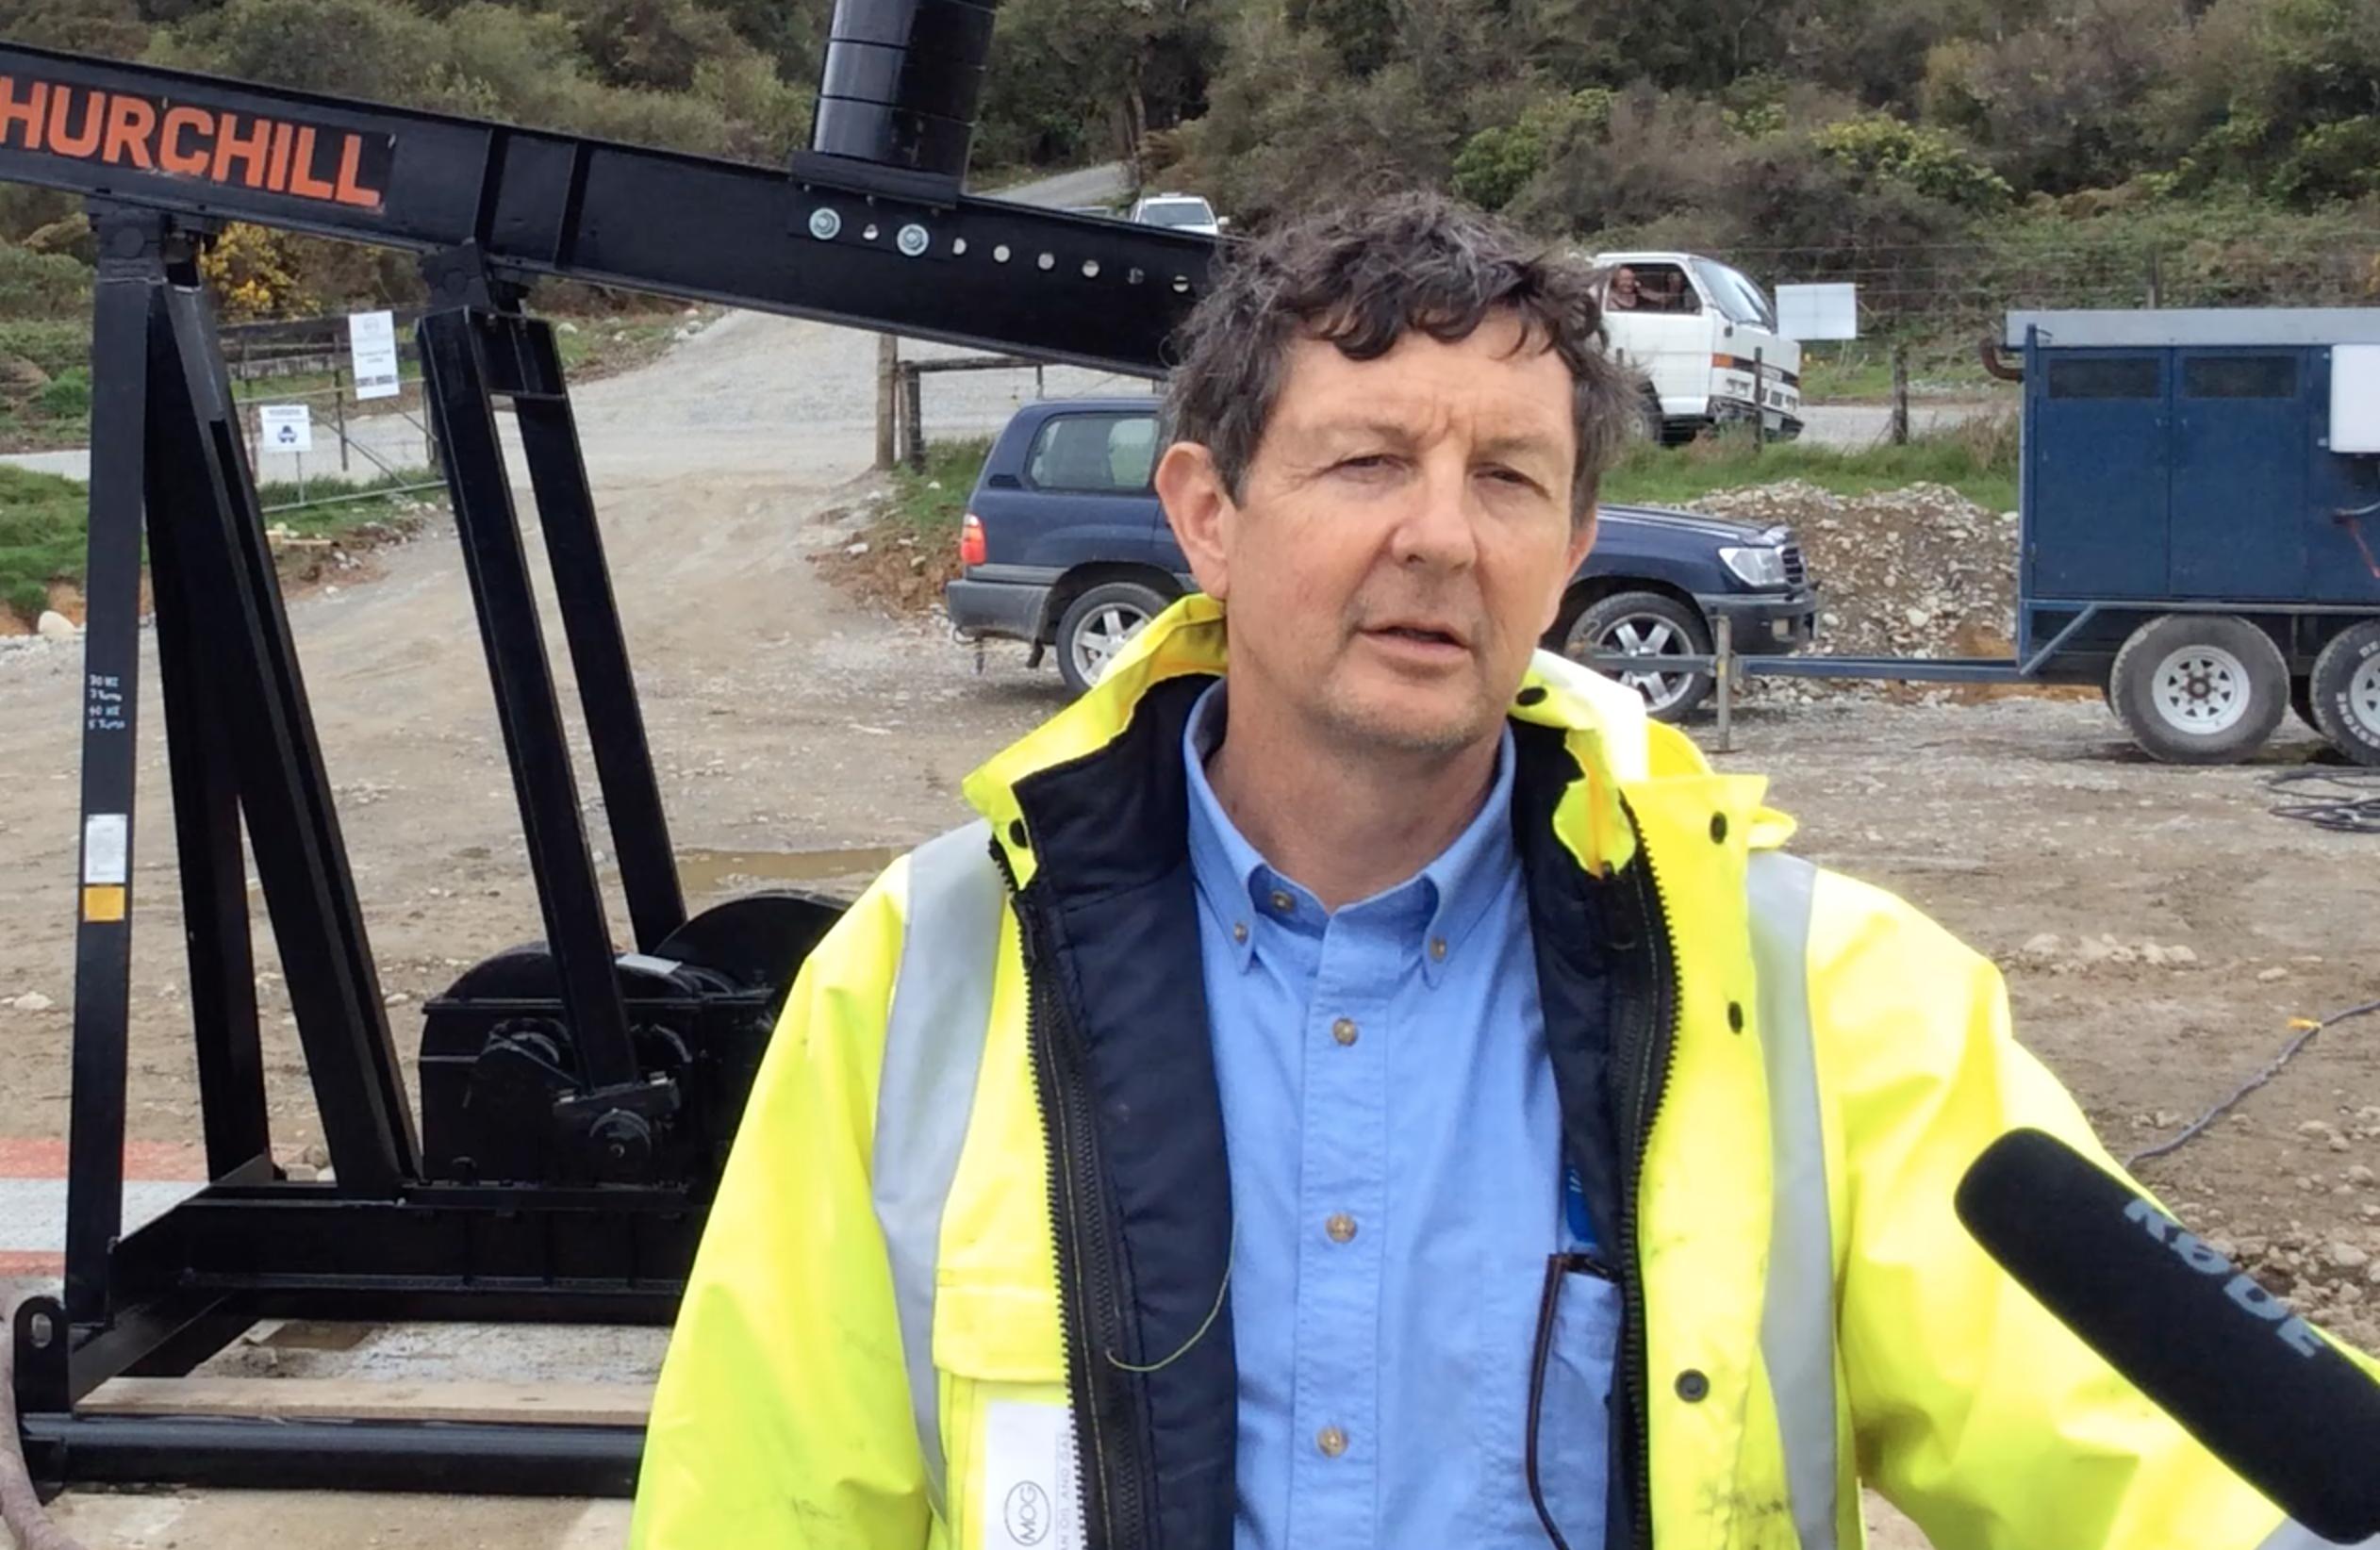 Mosman Oil & Gas - Update from Cross Roads well site